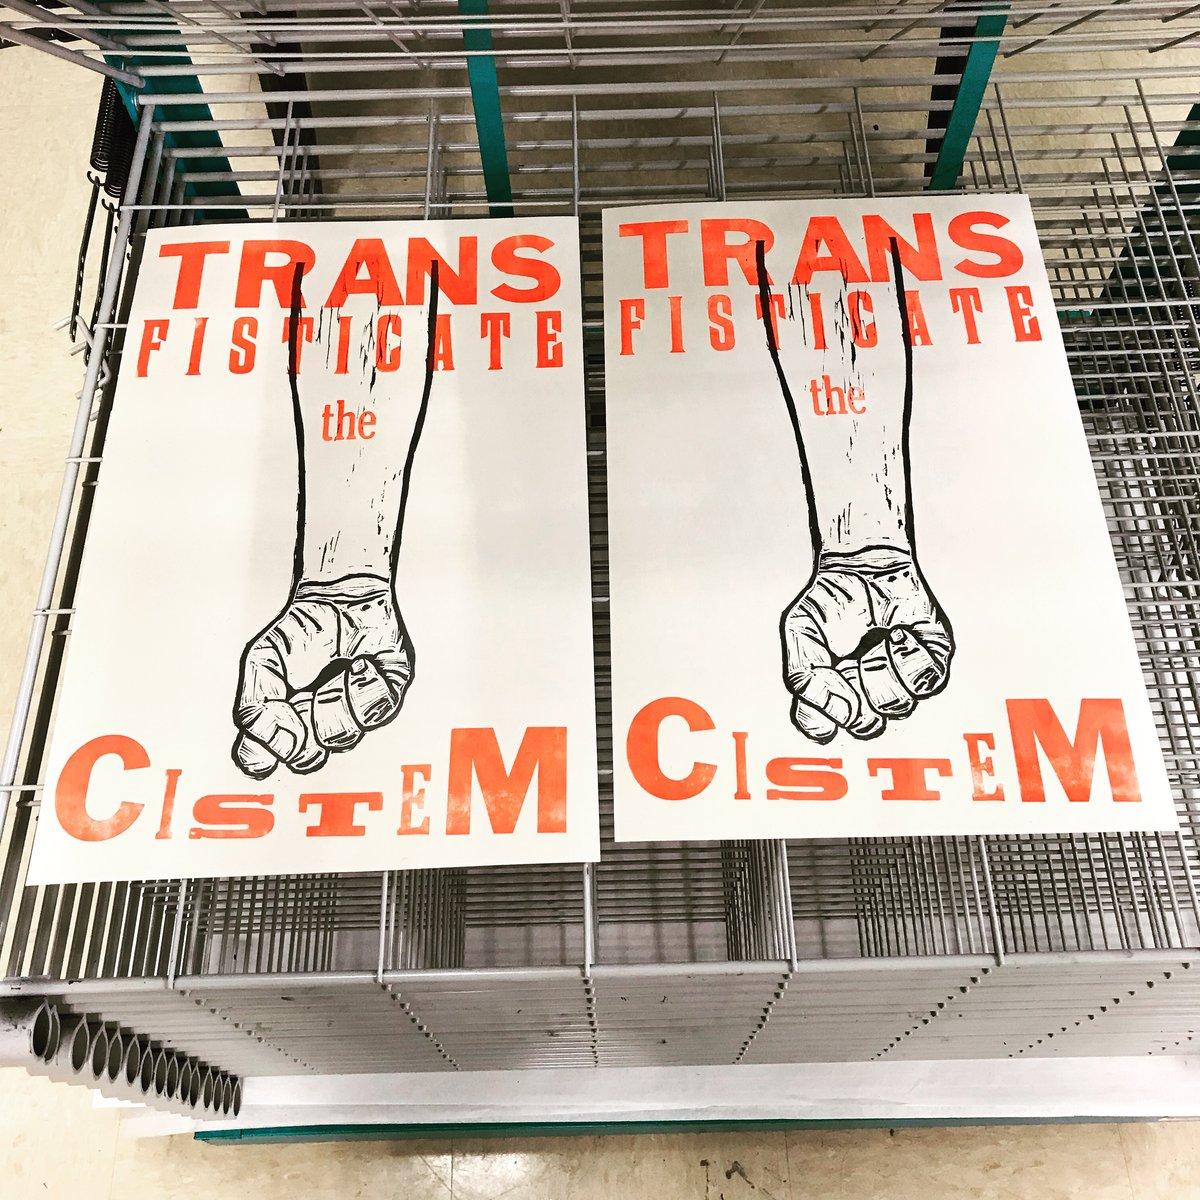 Image of Transfisticate